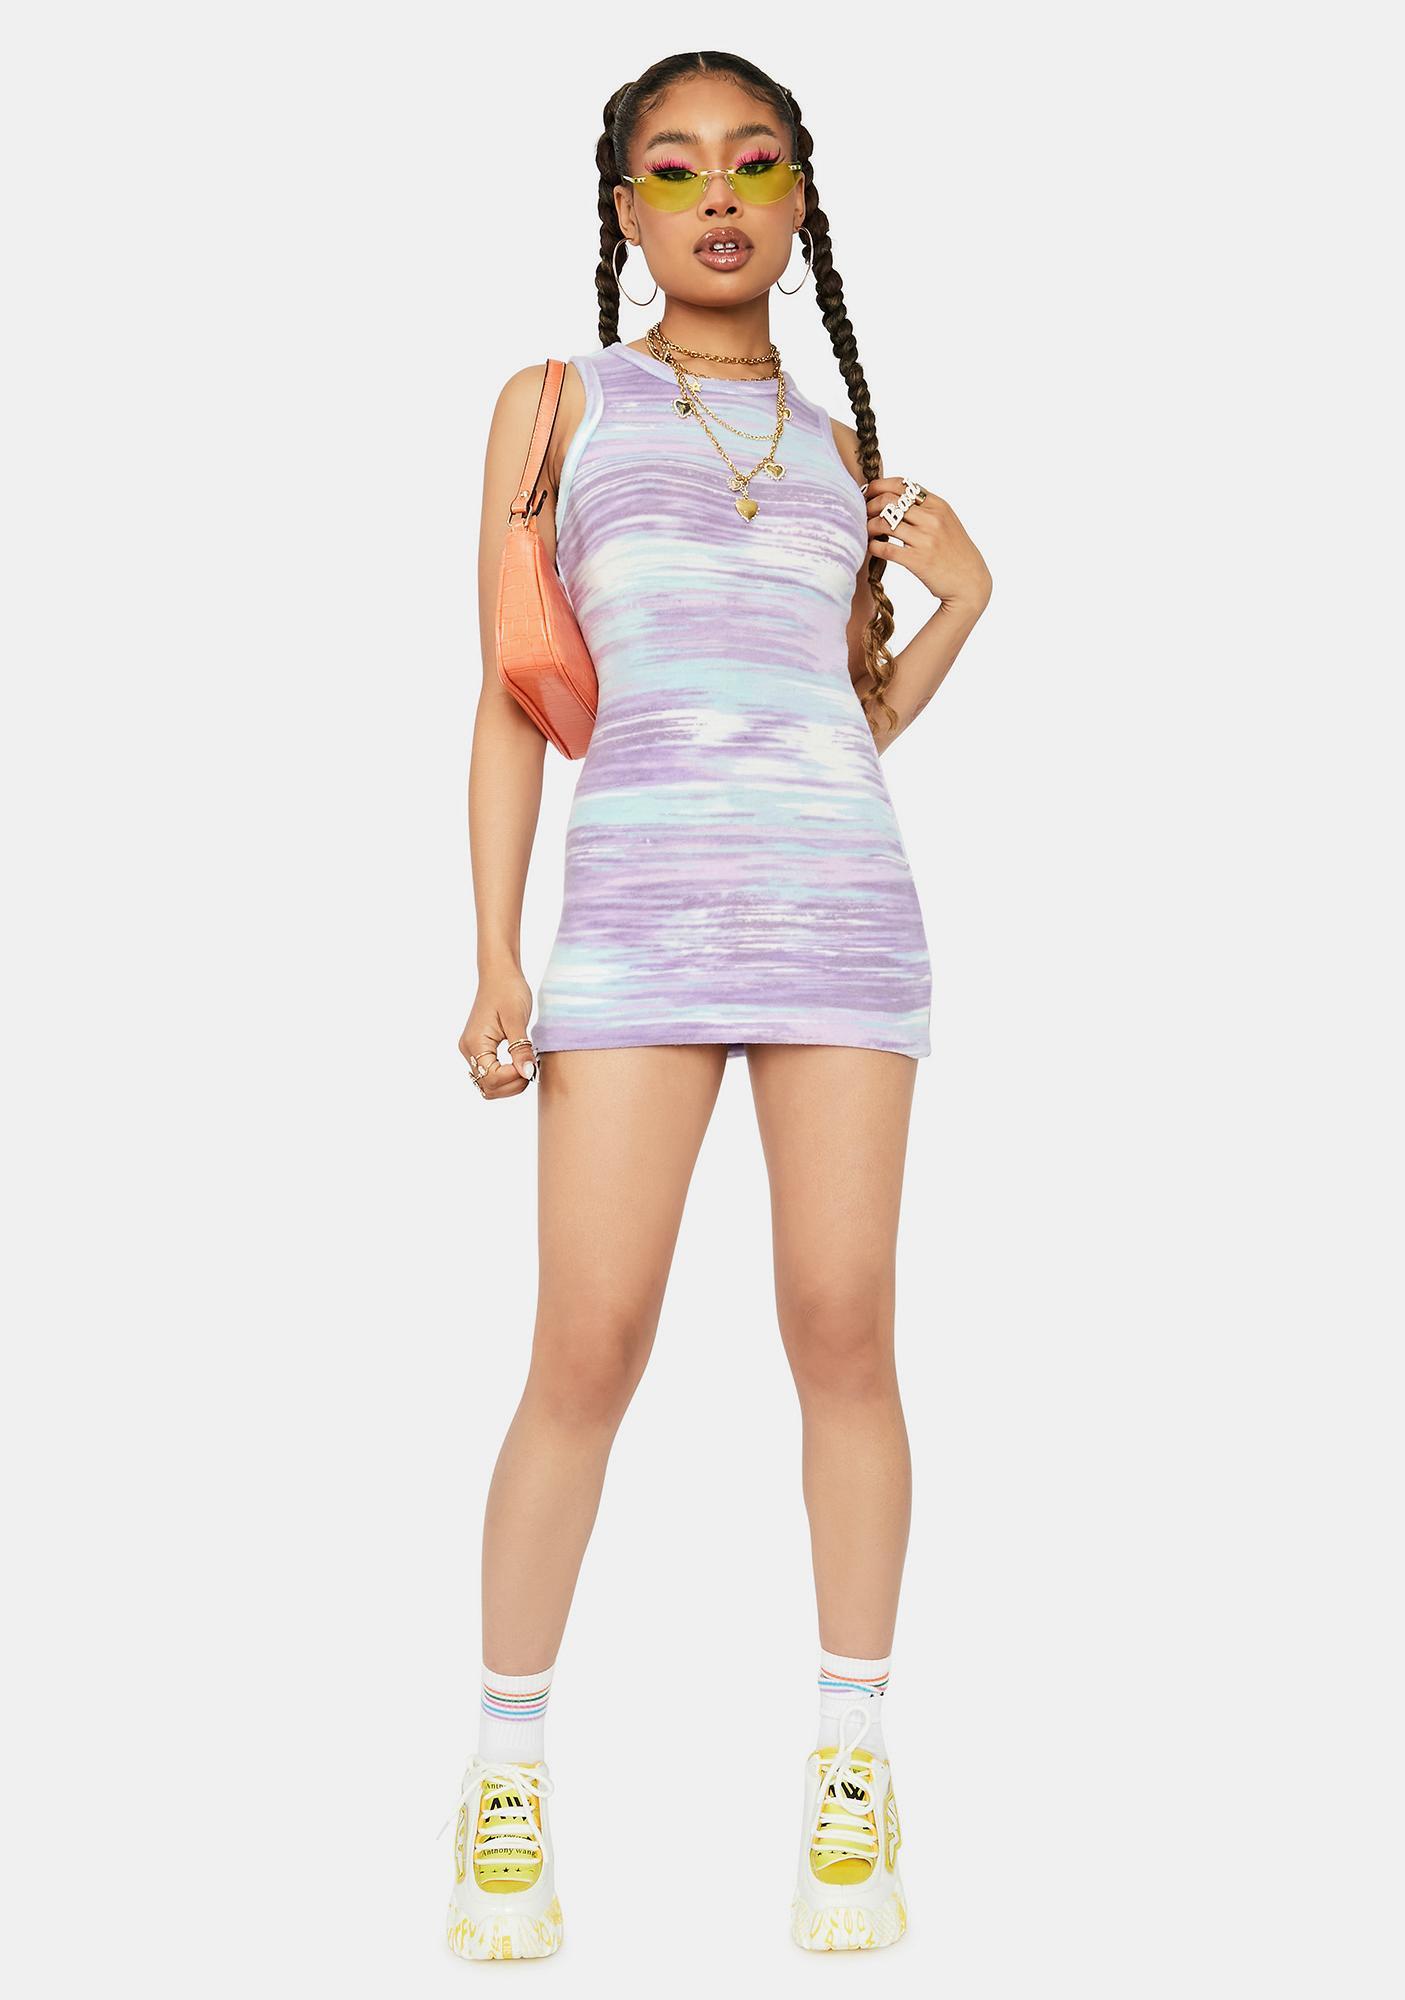 Lavender Broken Down Fuzzy Abstract Mini Dress